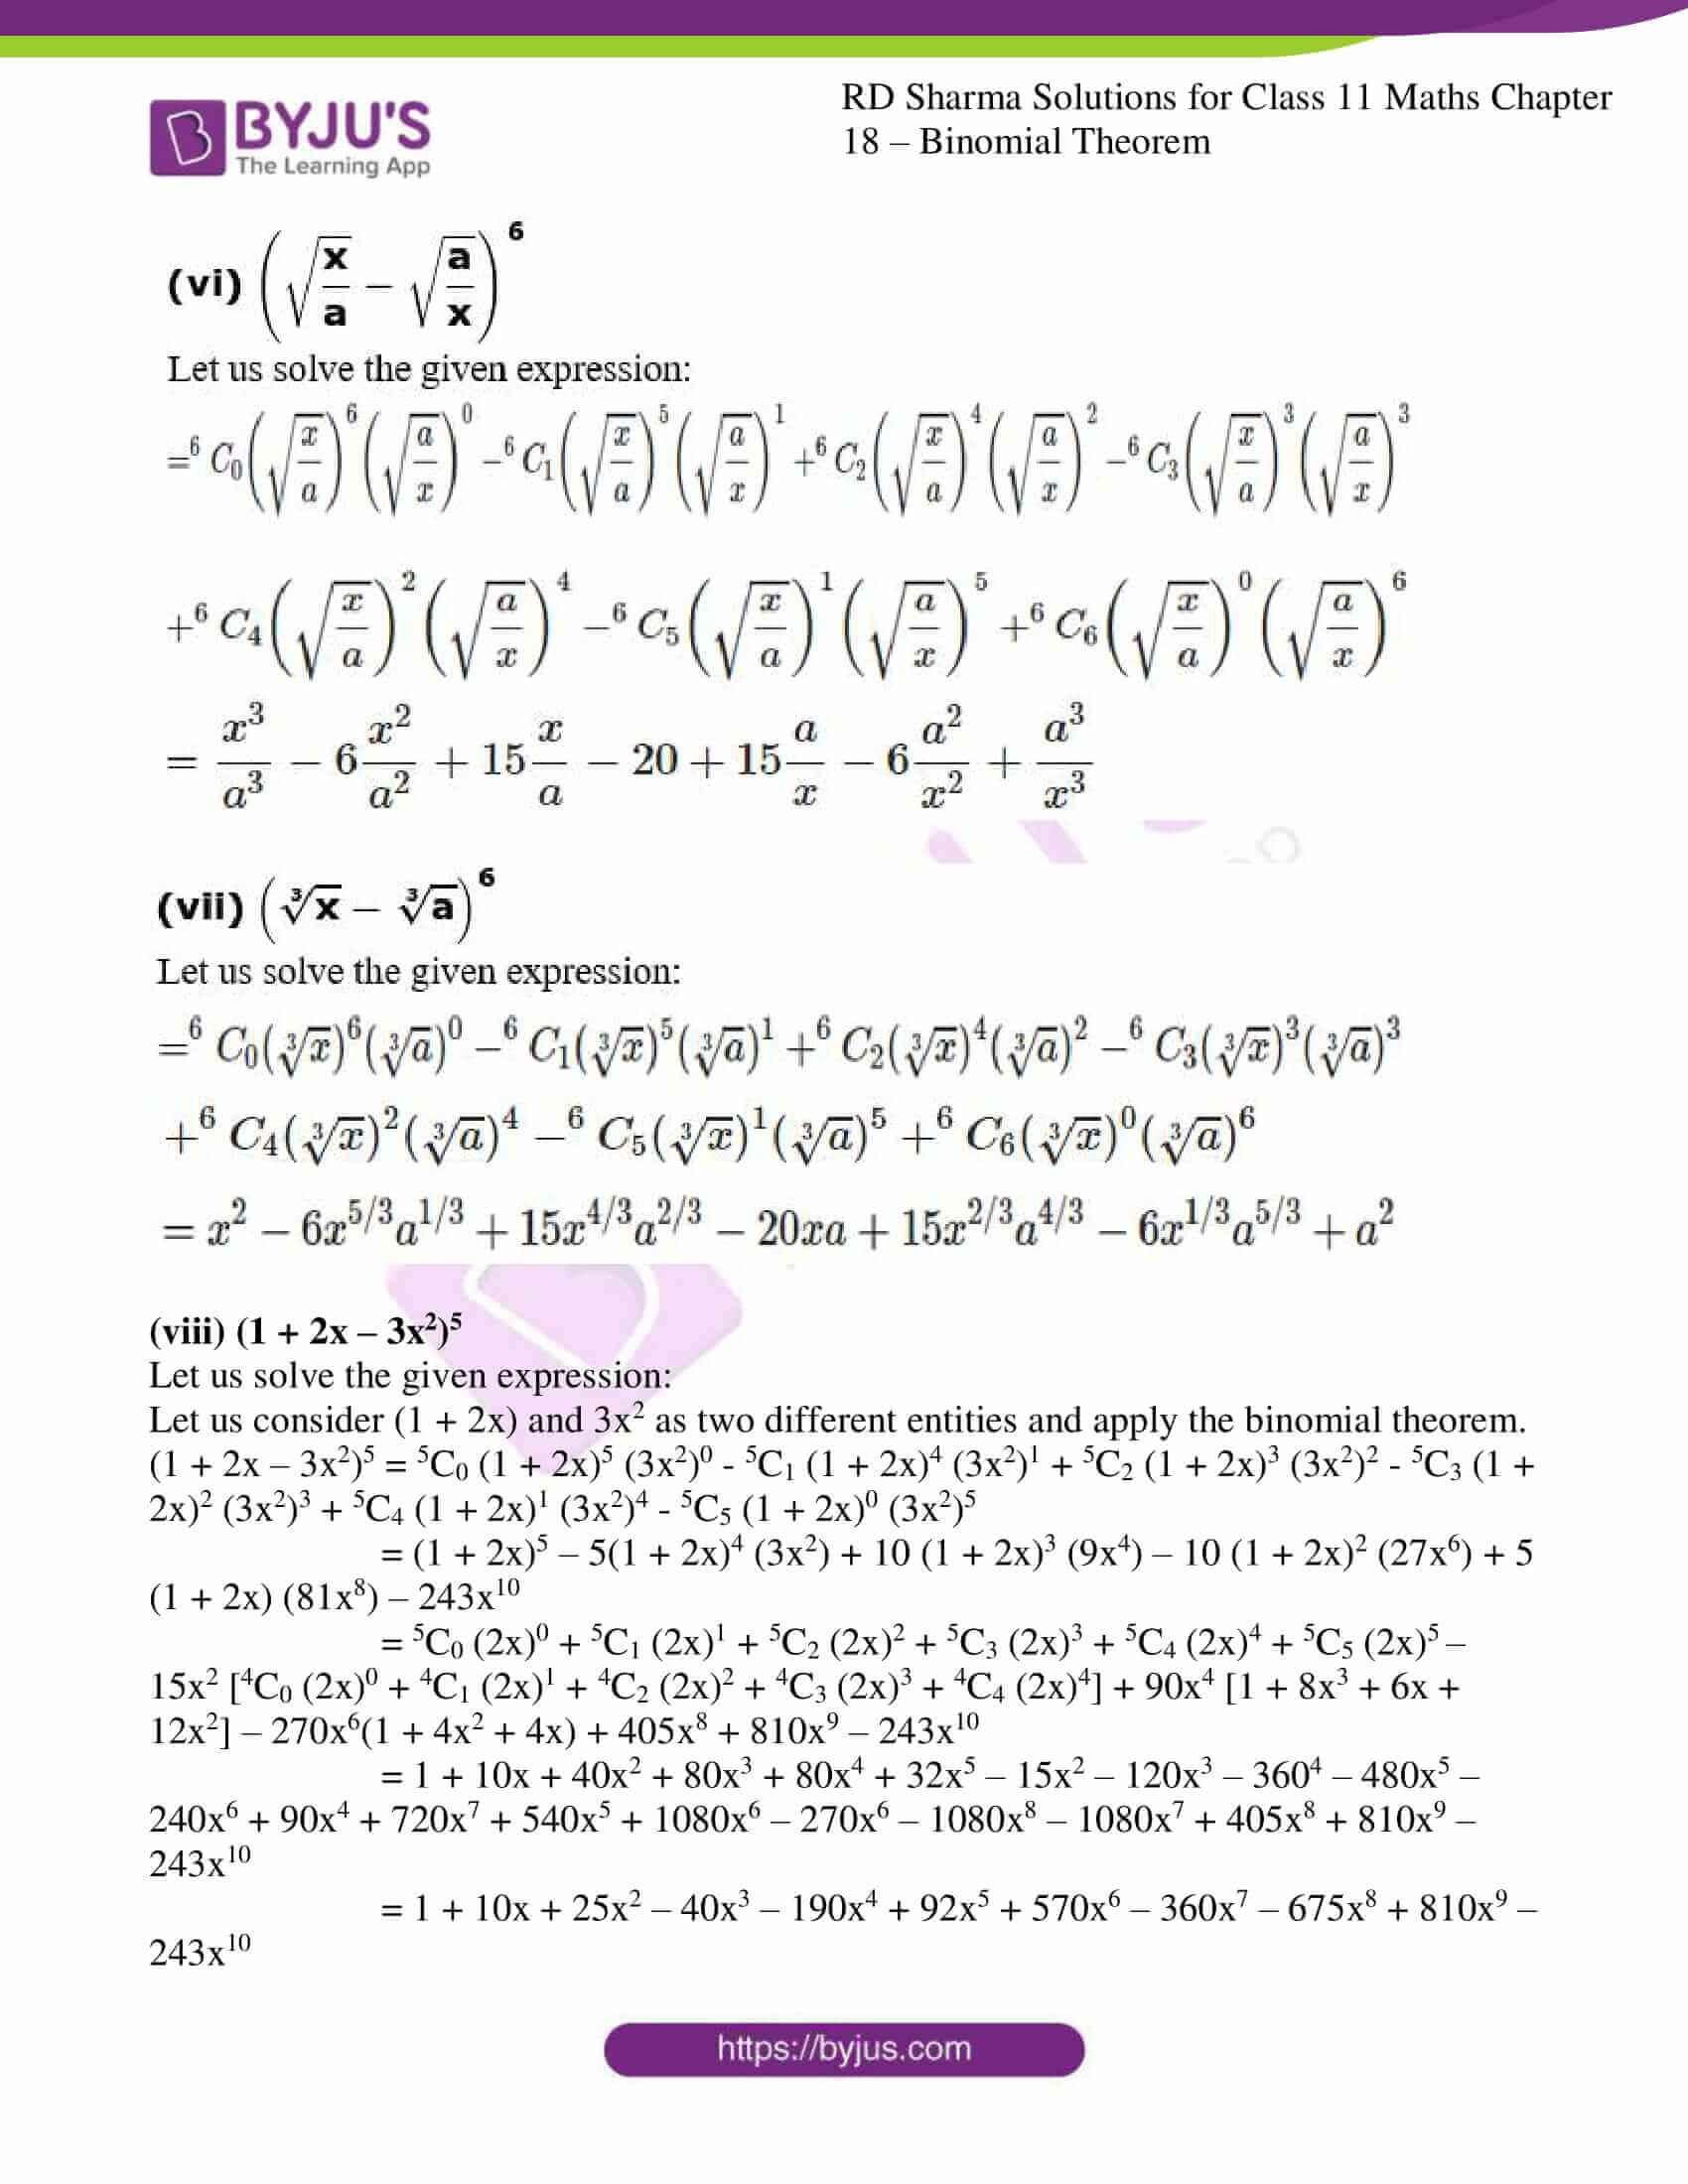 rd sharma class 11 maths ch 18 ex 1 03